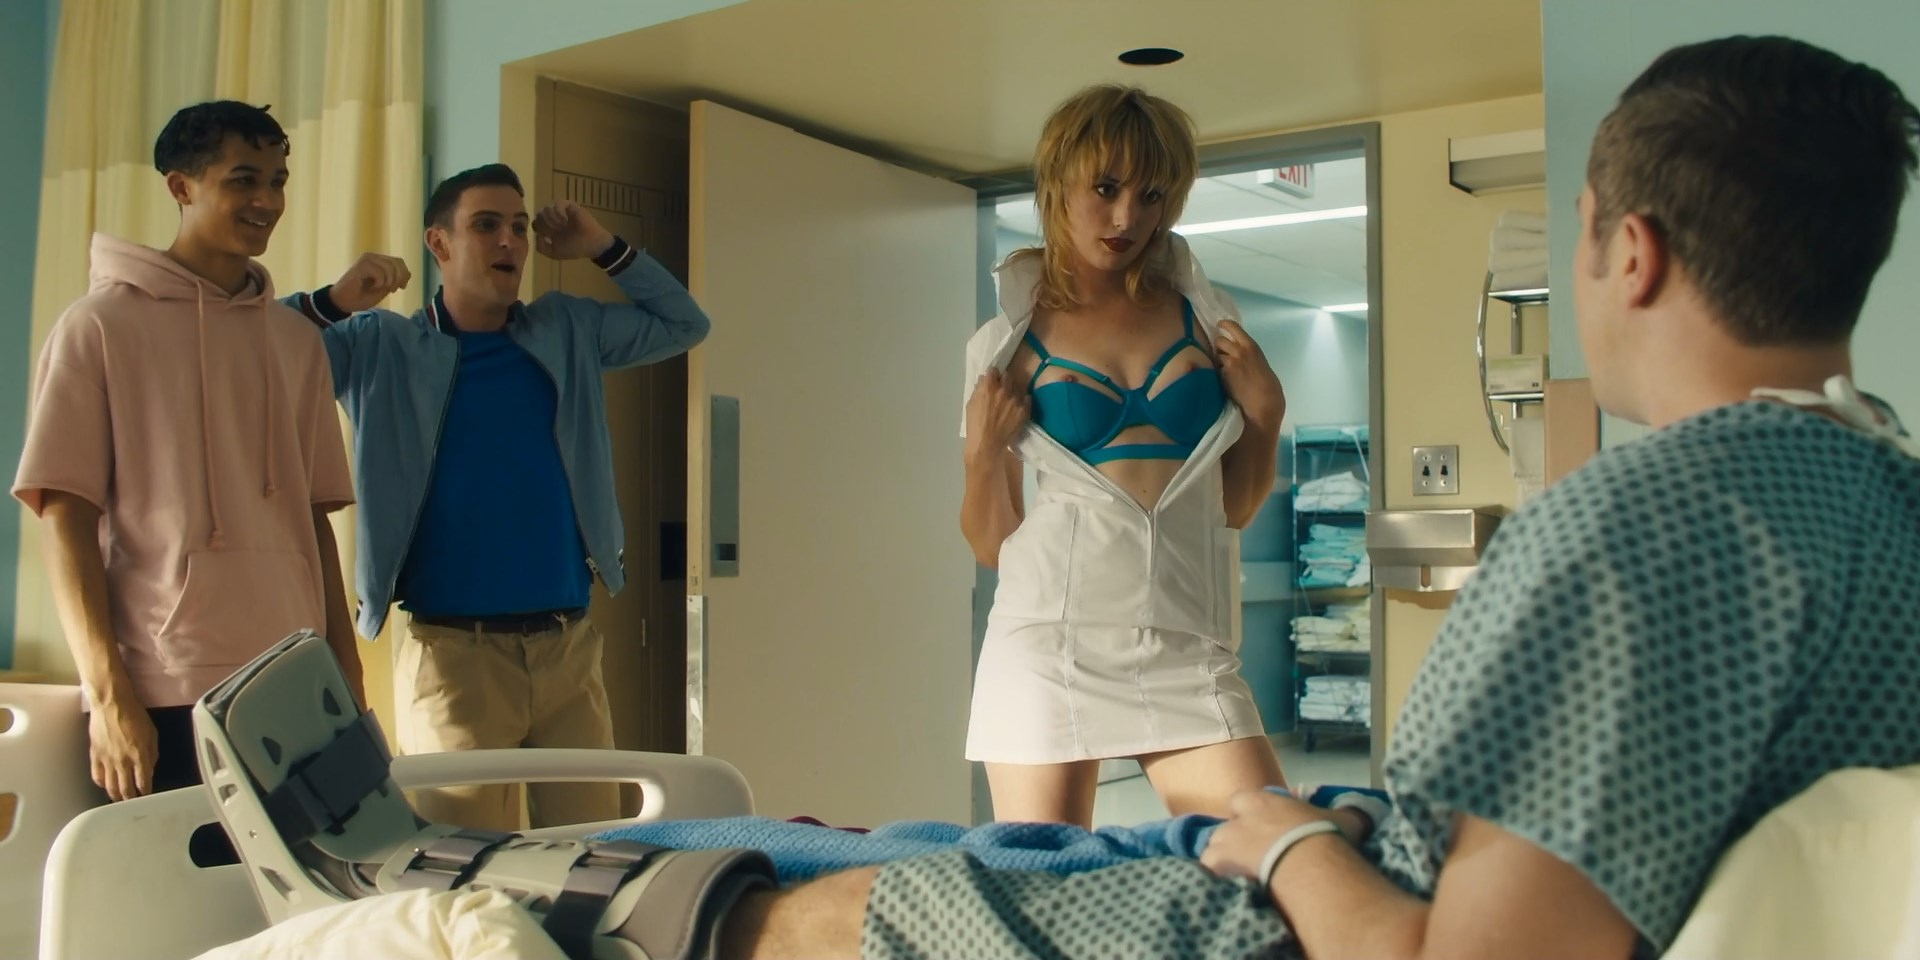 Gaite Jansen nude, Carla Gugino sexy, Alice Haig nude, Corrin Evans nude - Jett s01e04 (2019)